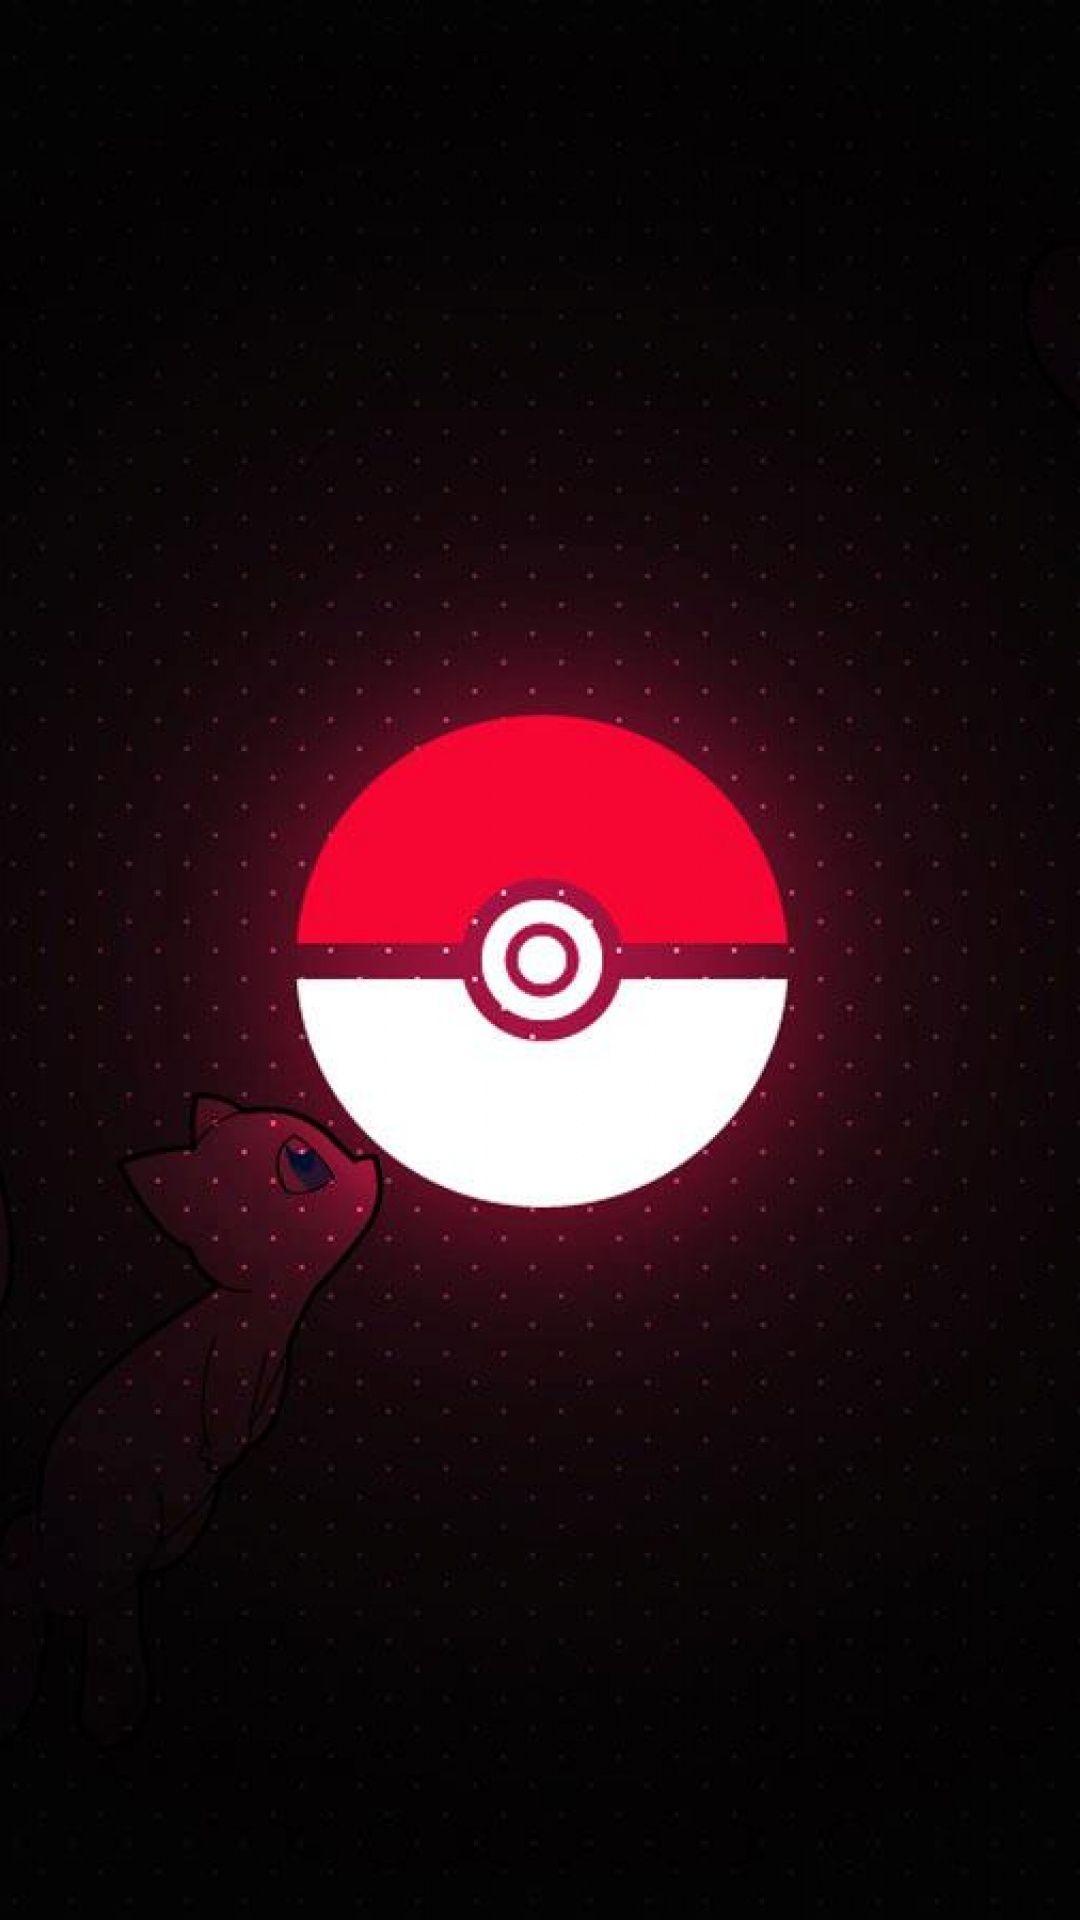 Pokemon Mobile Wallpapers Photo Is 4k Wallpaper Pokemon Anime Pokemon Art